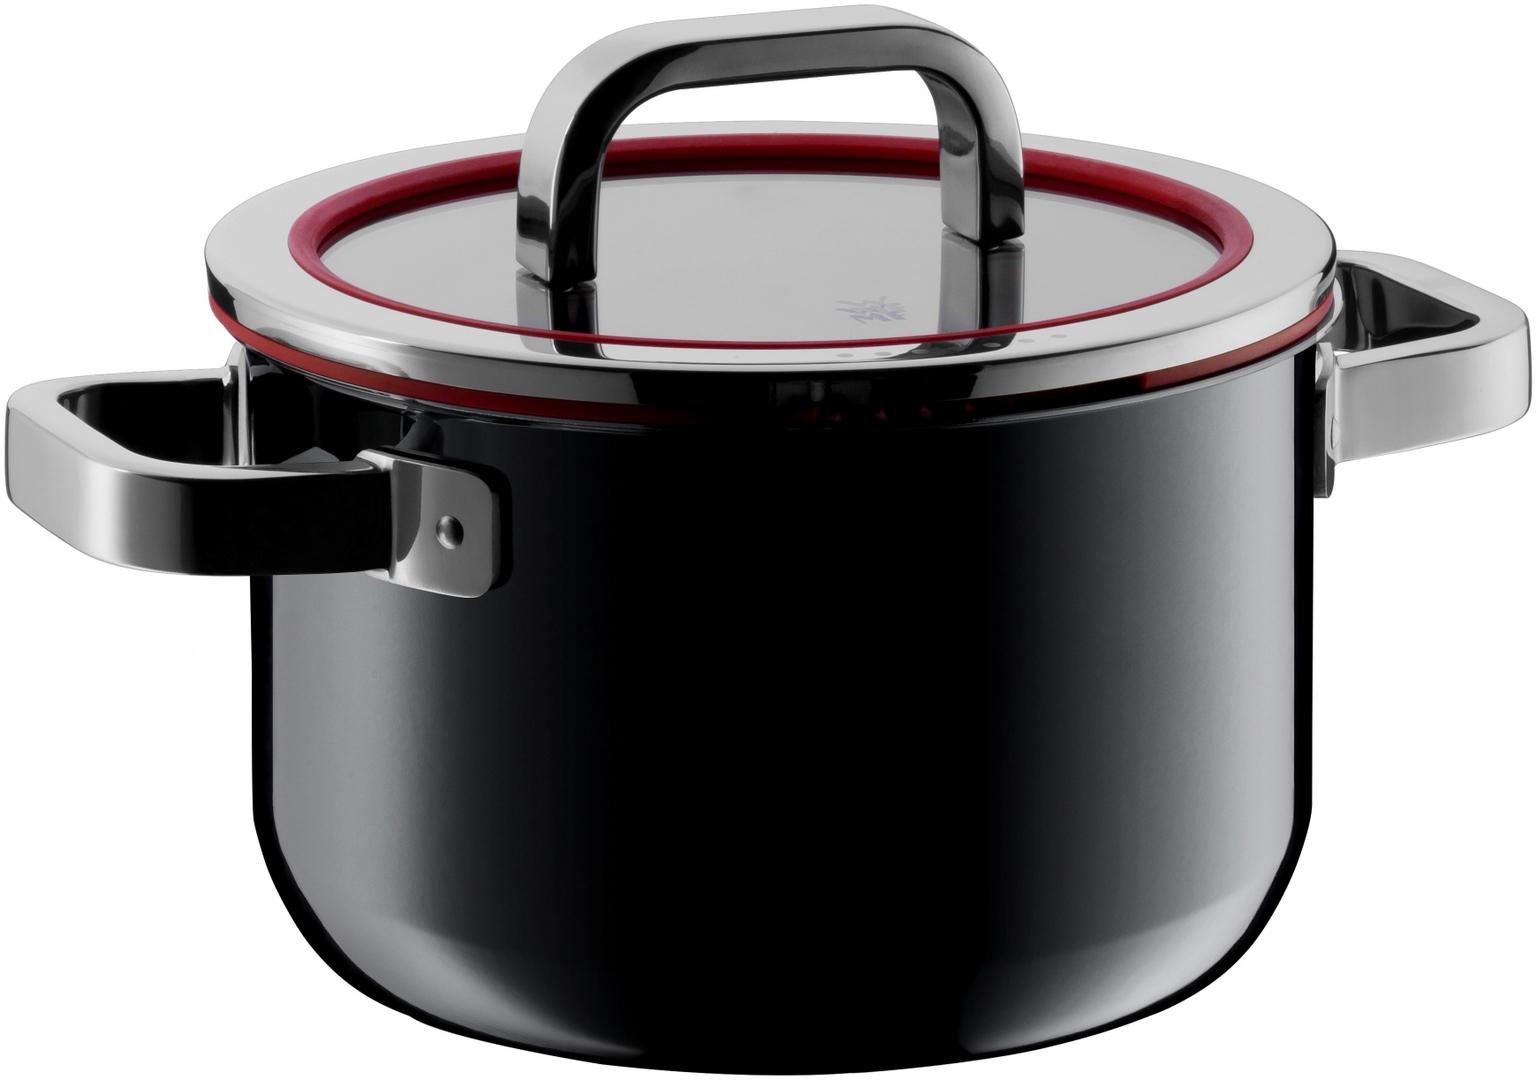 Vysoký hrniec FUSIONTEC Functional WMF čierny 20 cm 3,7 l